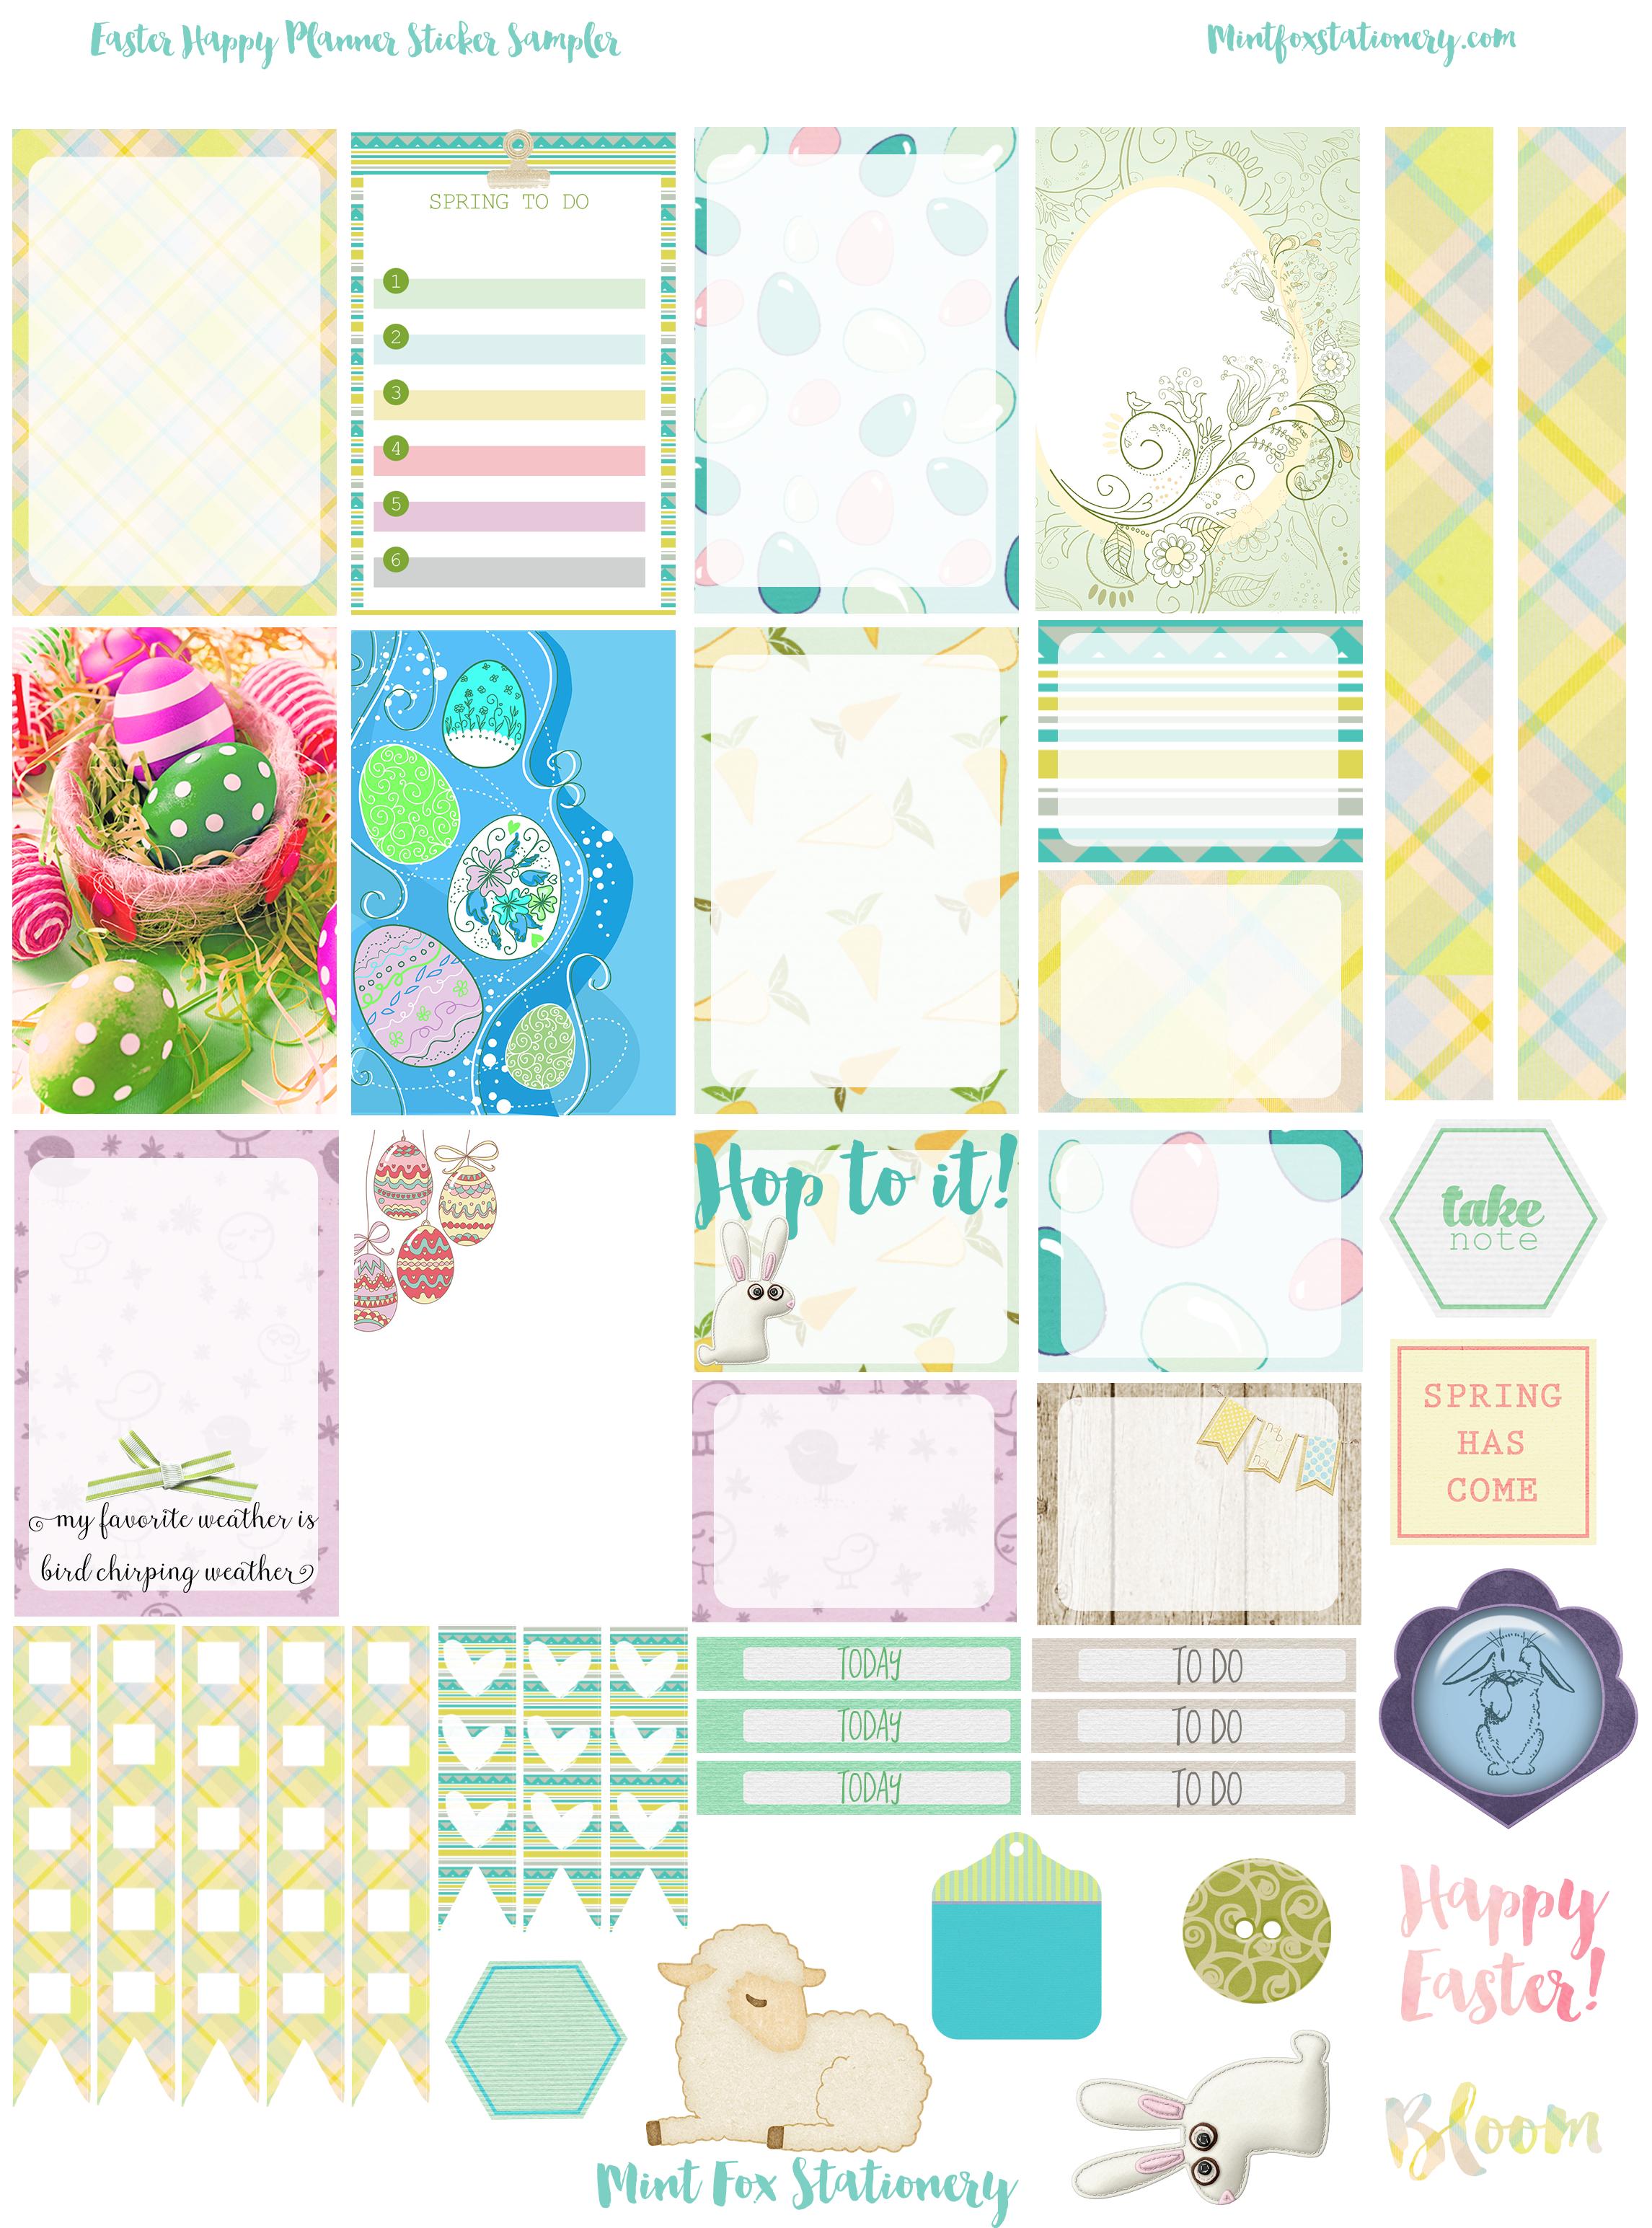 Easter Happy Planner Printable Sticker Sampler Free! - Free Printable Planner Stickers